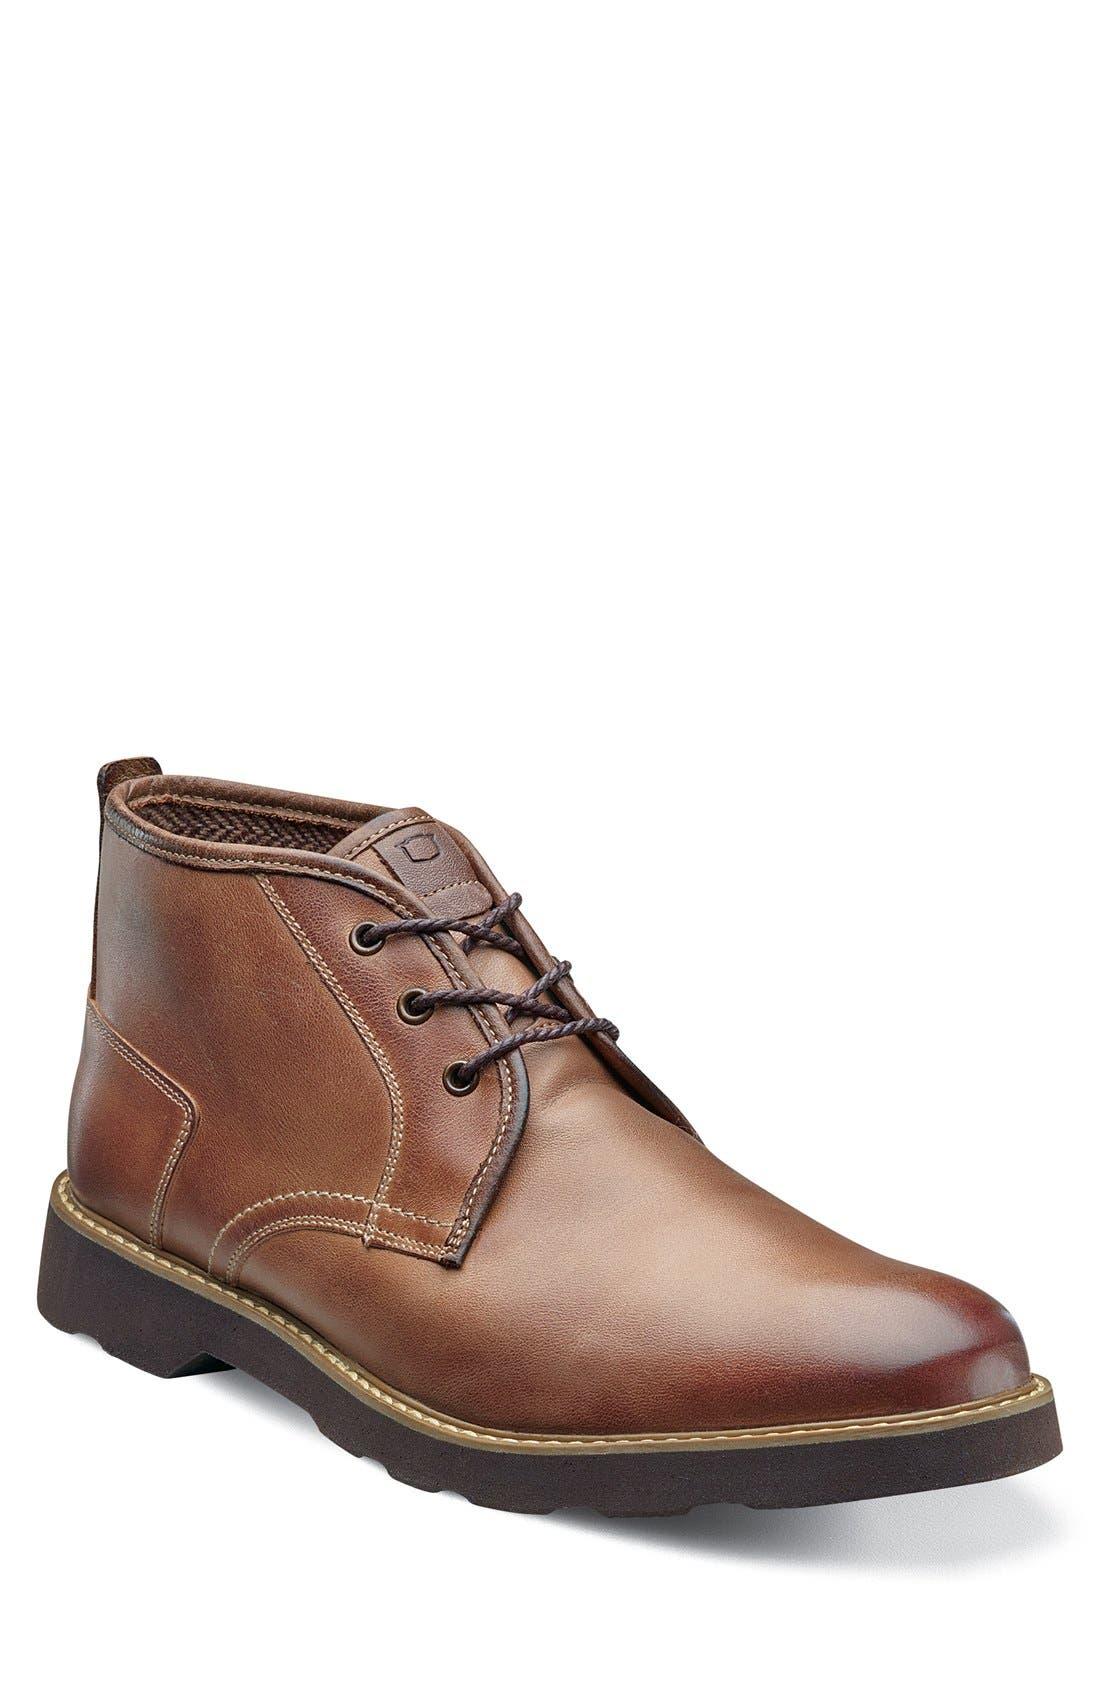 Main Image - Florsheim 'Casey' Chukka Boot (Men)